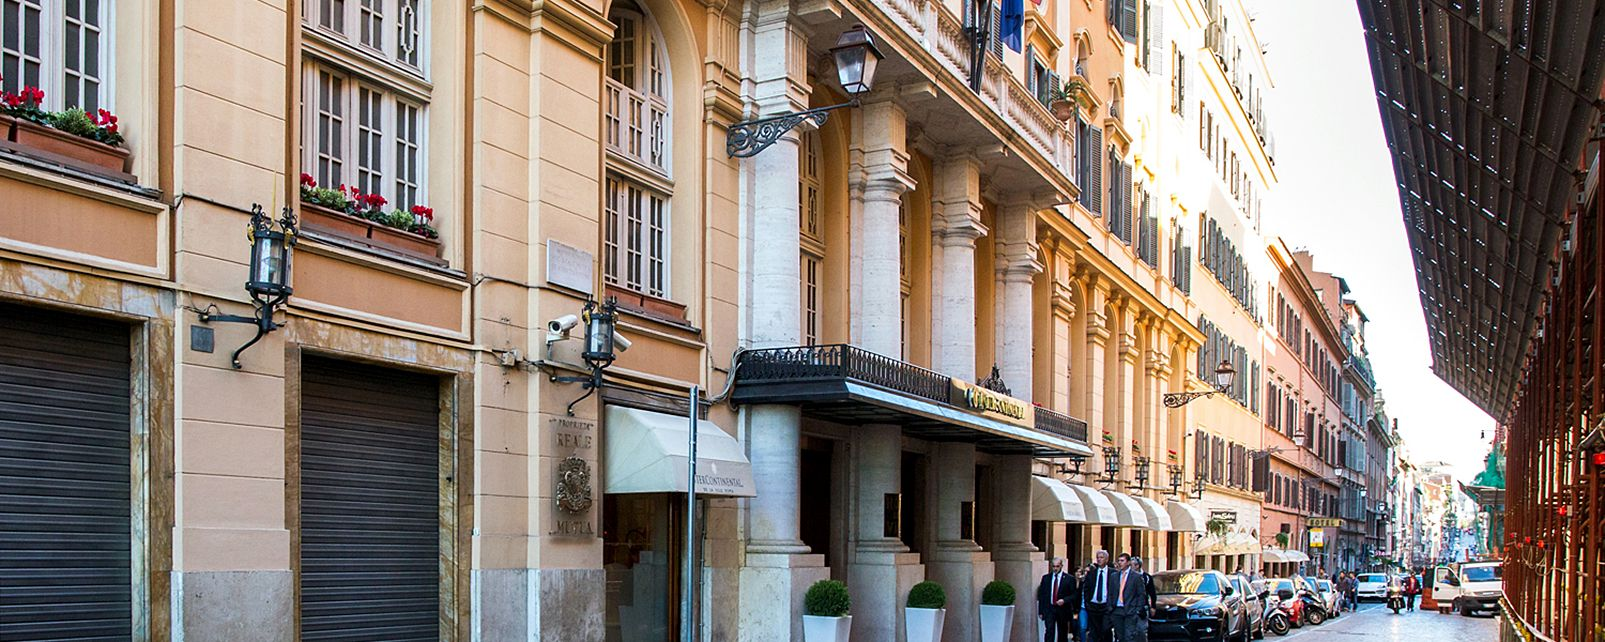 Hôtel InterContinental De La Ville Roma